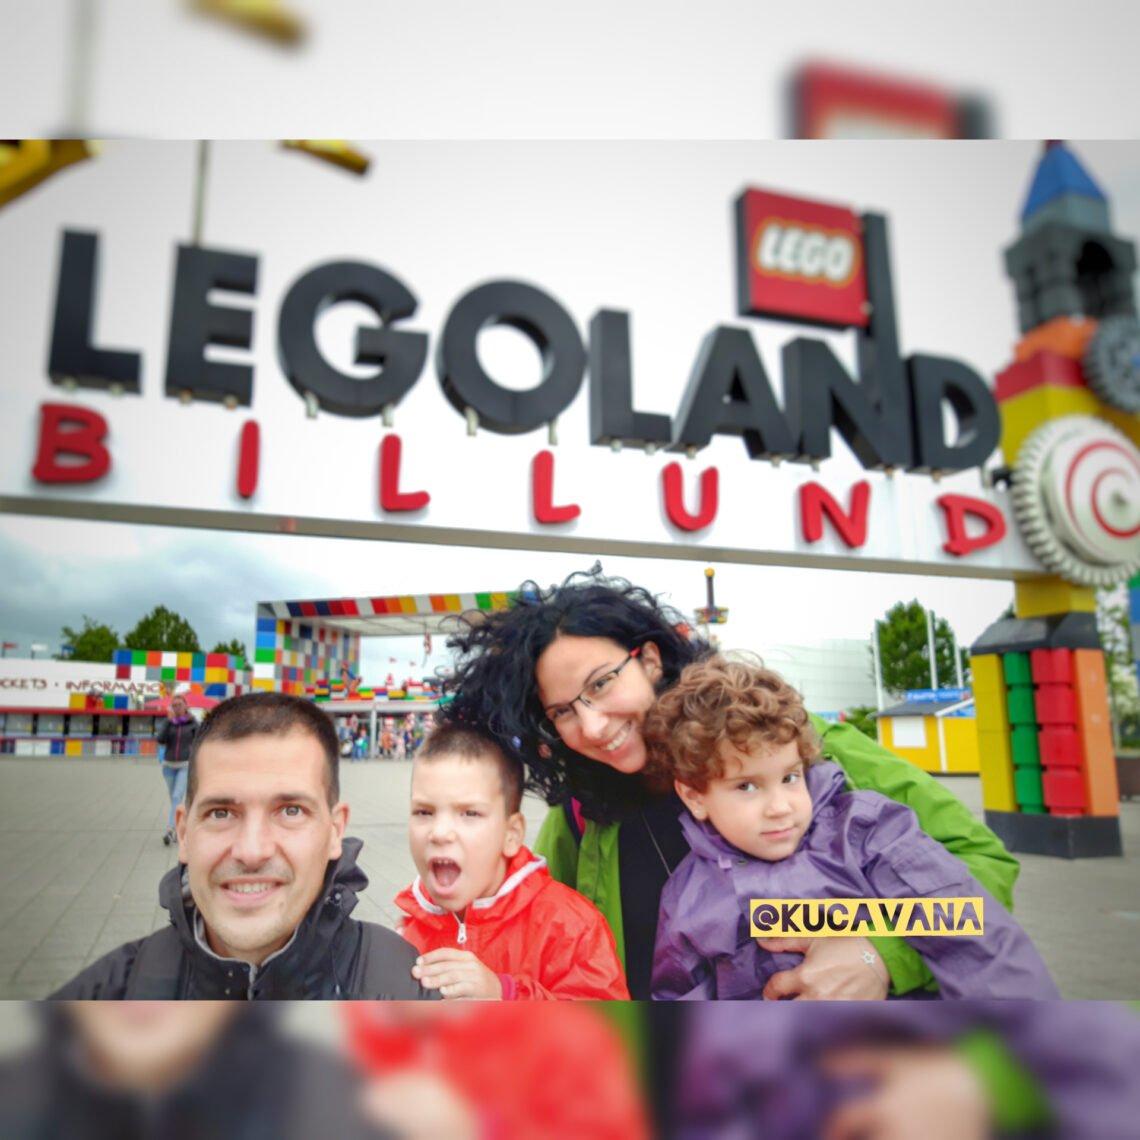 Legoland Billund en autocaravana